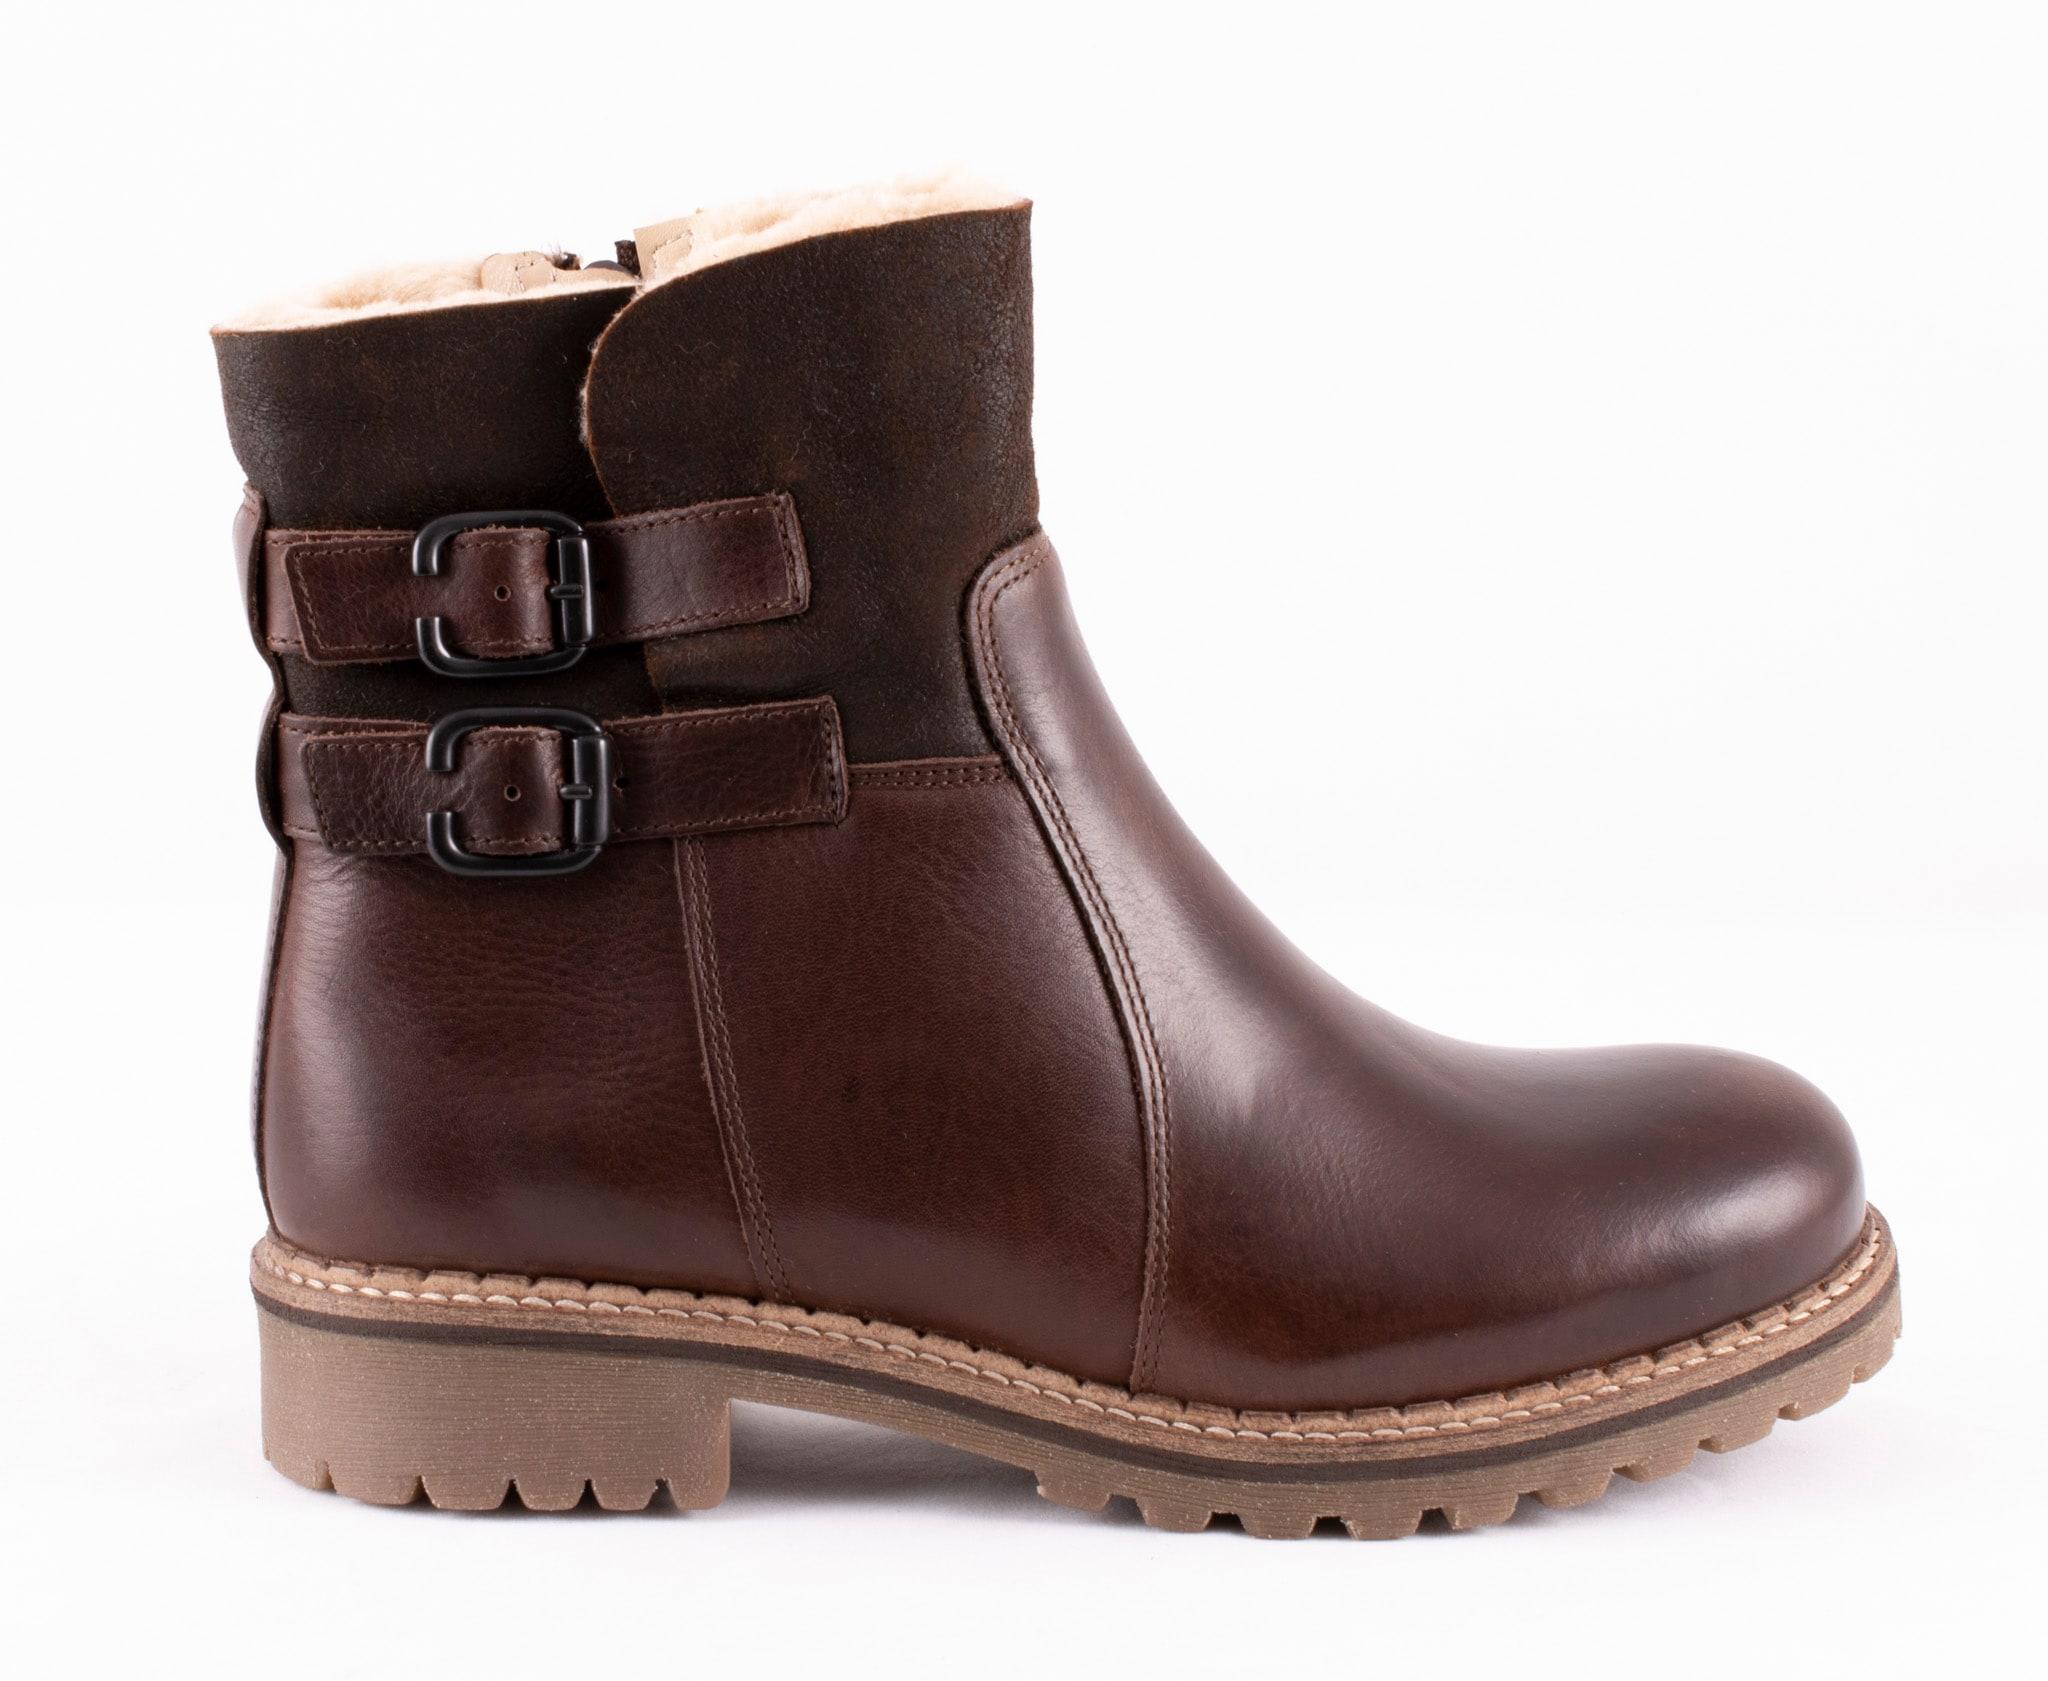 Smilla boots